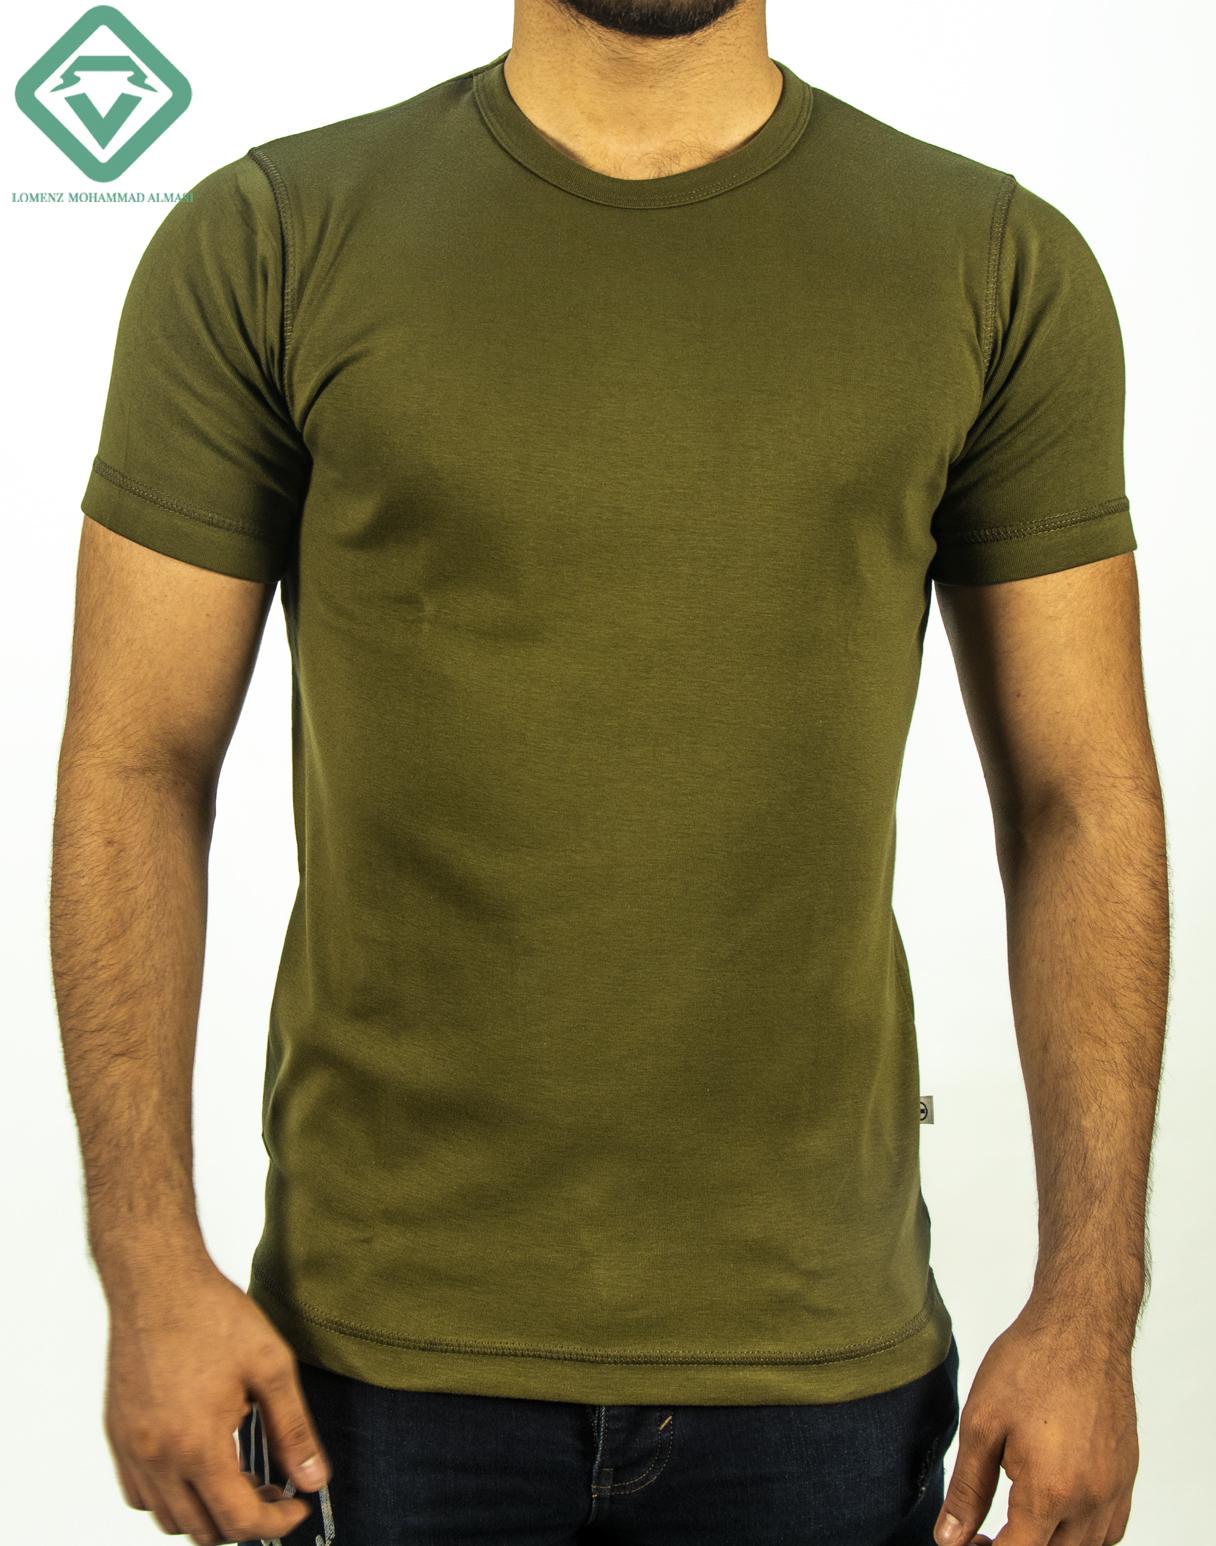 تیشرت تام تیلور رنگ سبز | فروشگاه لومنز